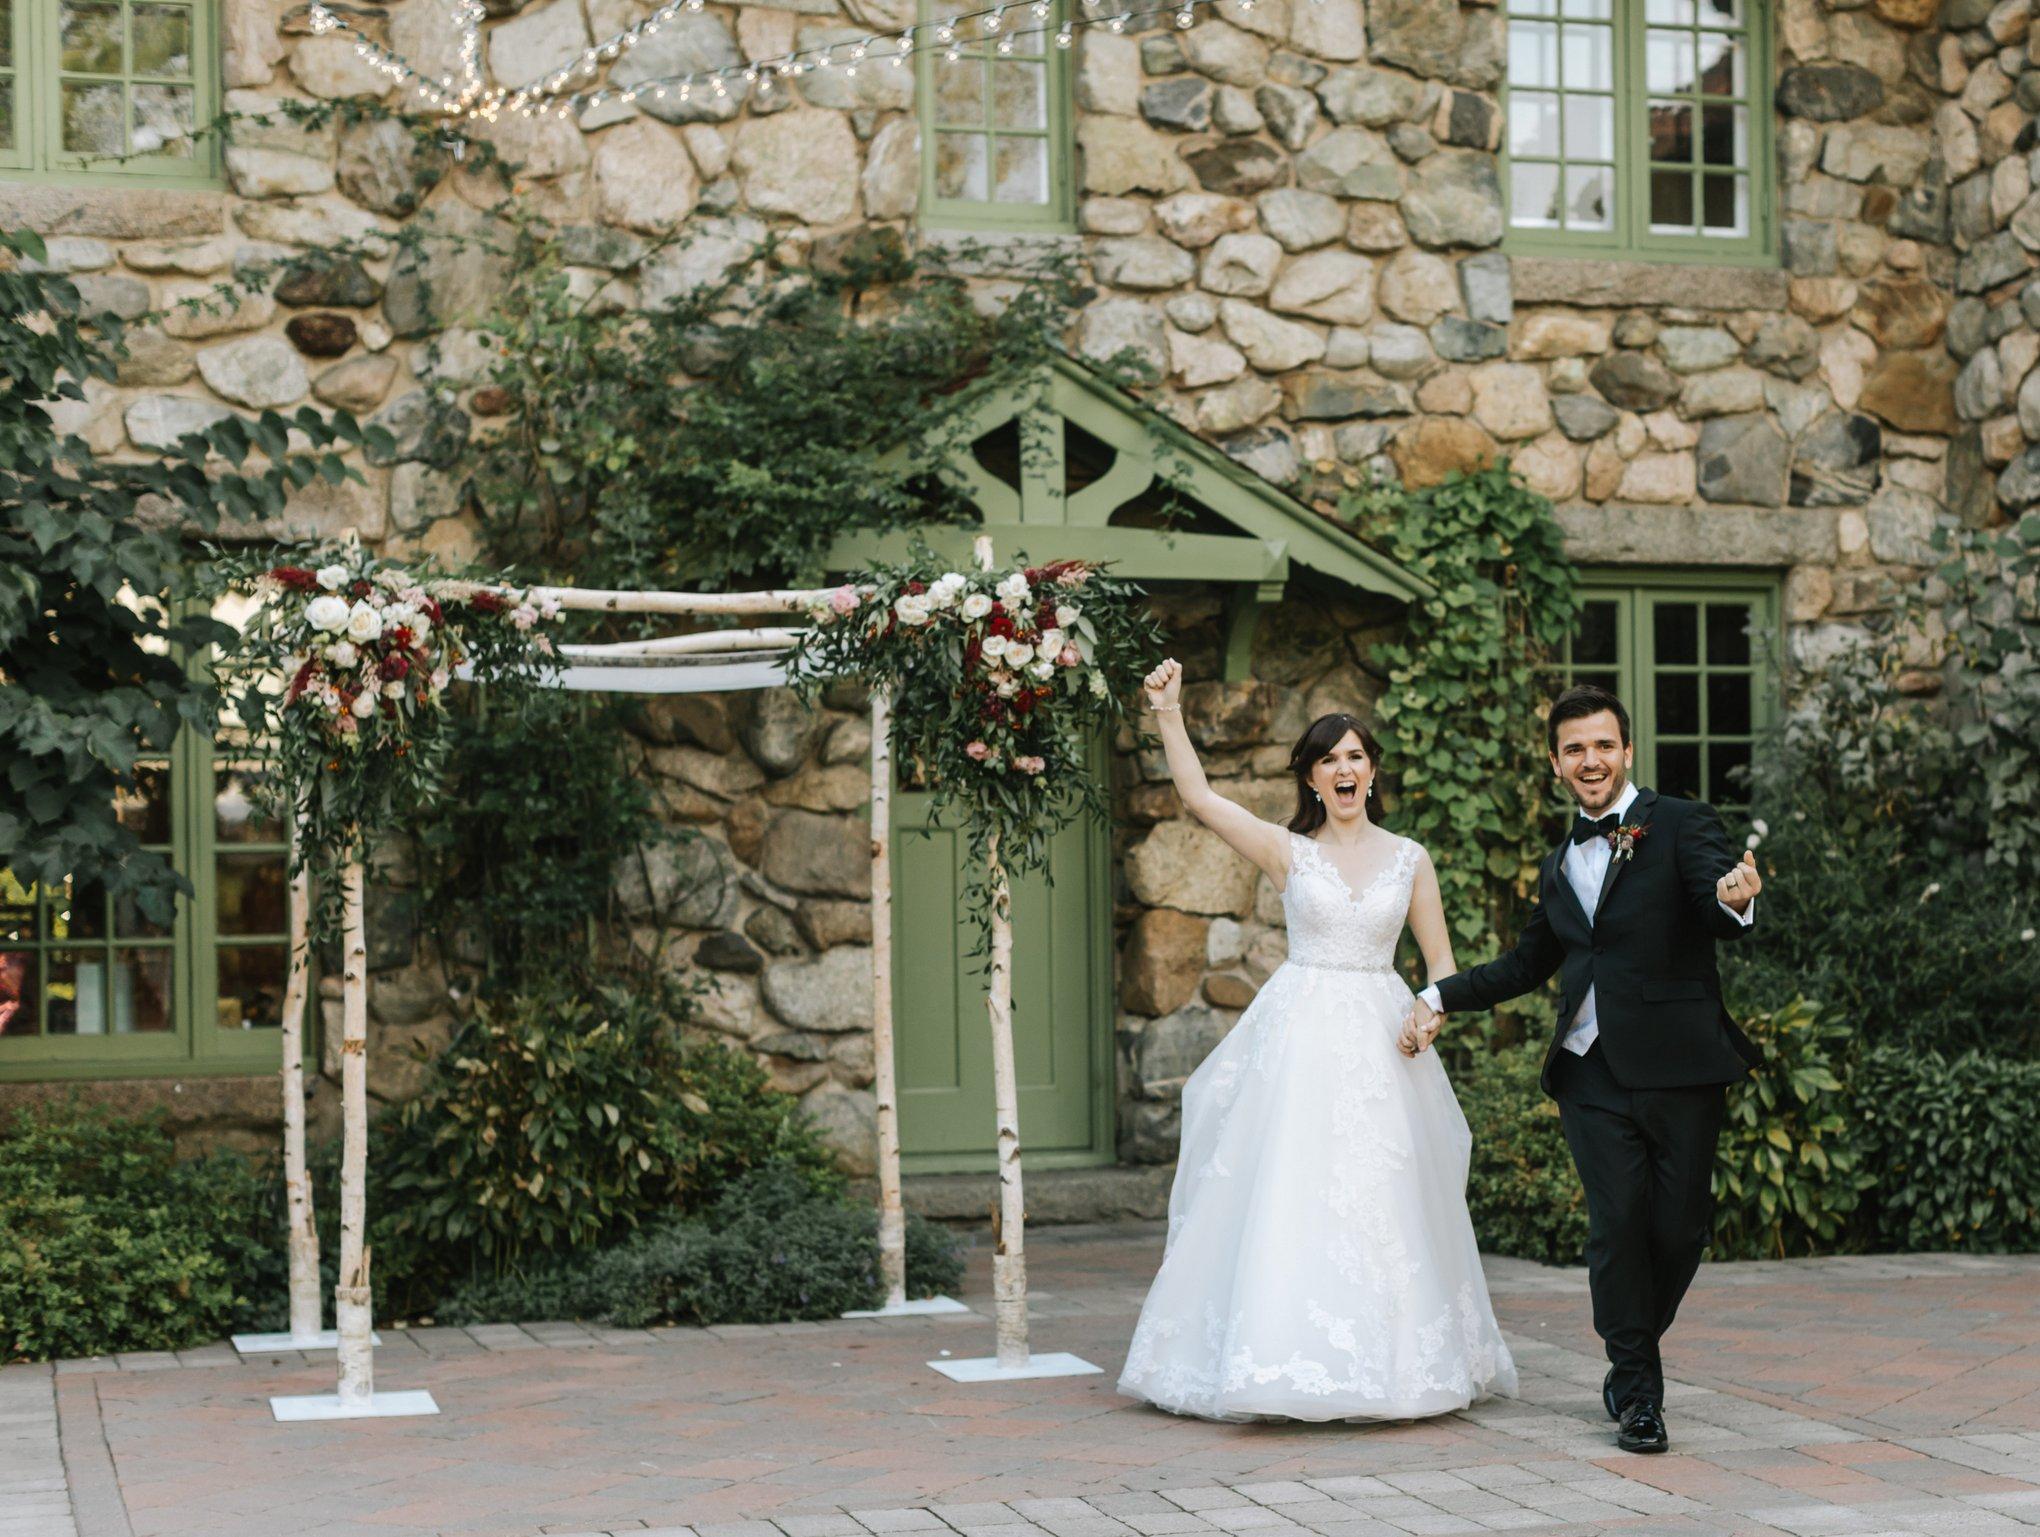 Willowdale-Estate-Wedding-Photographer-44.jpg